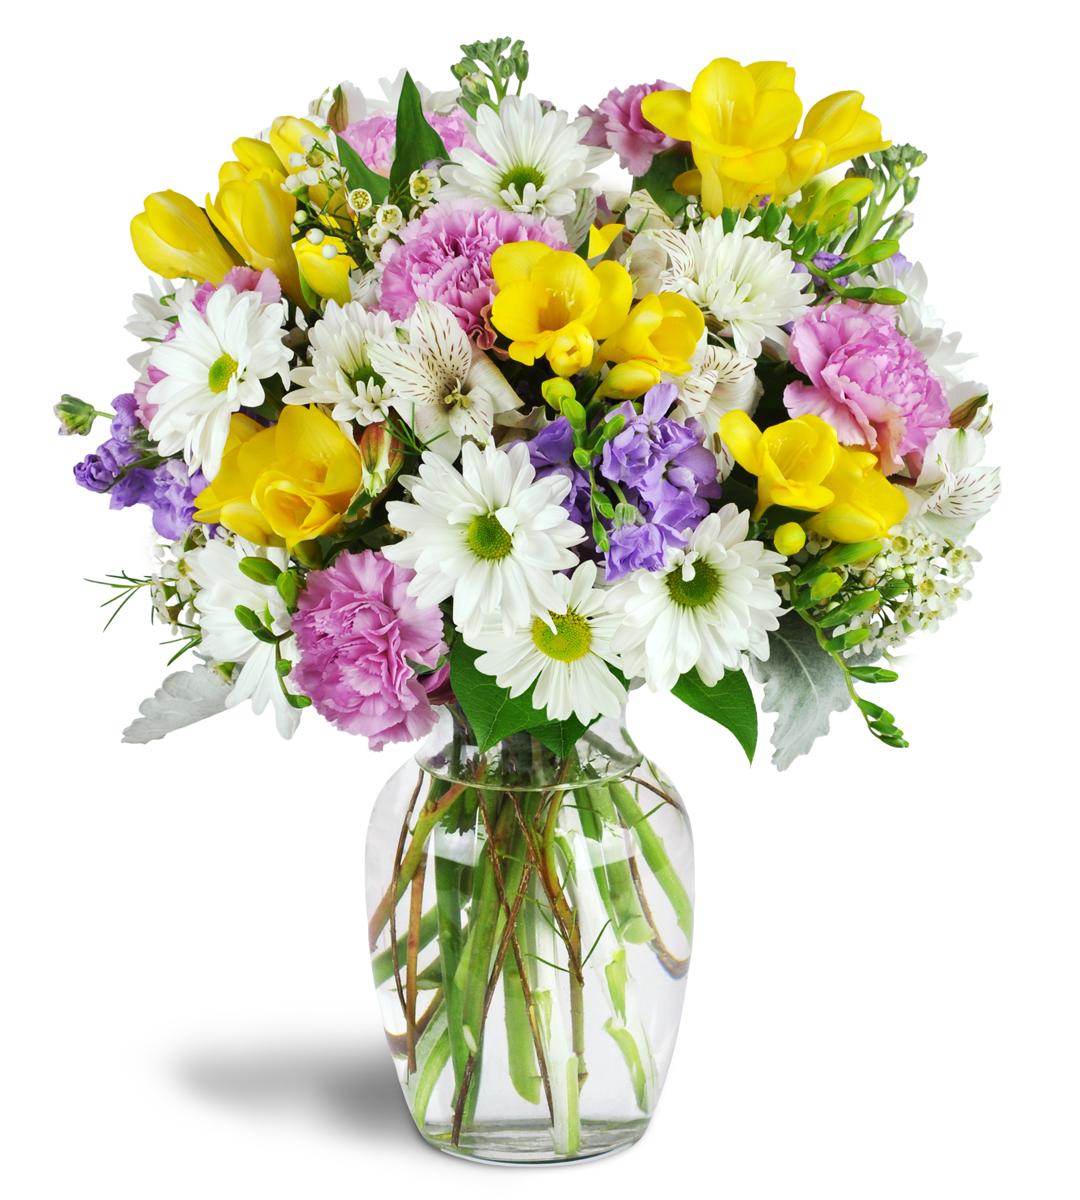 Sunshower Bouquet Manchester Township Nj Florist